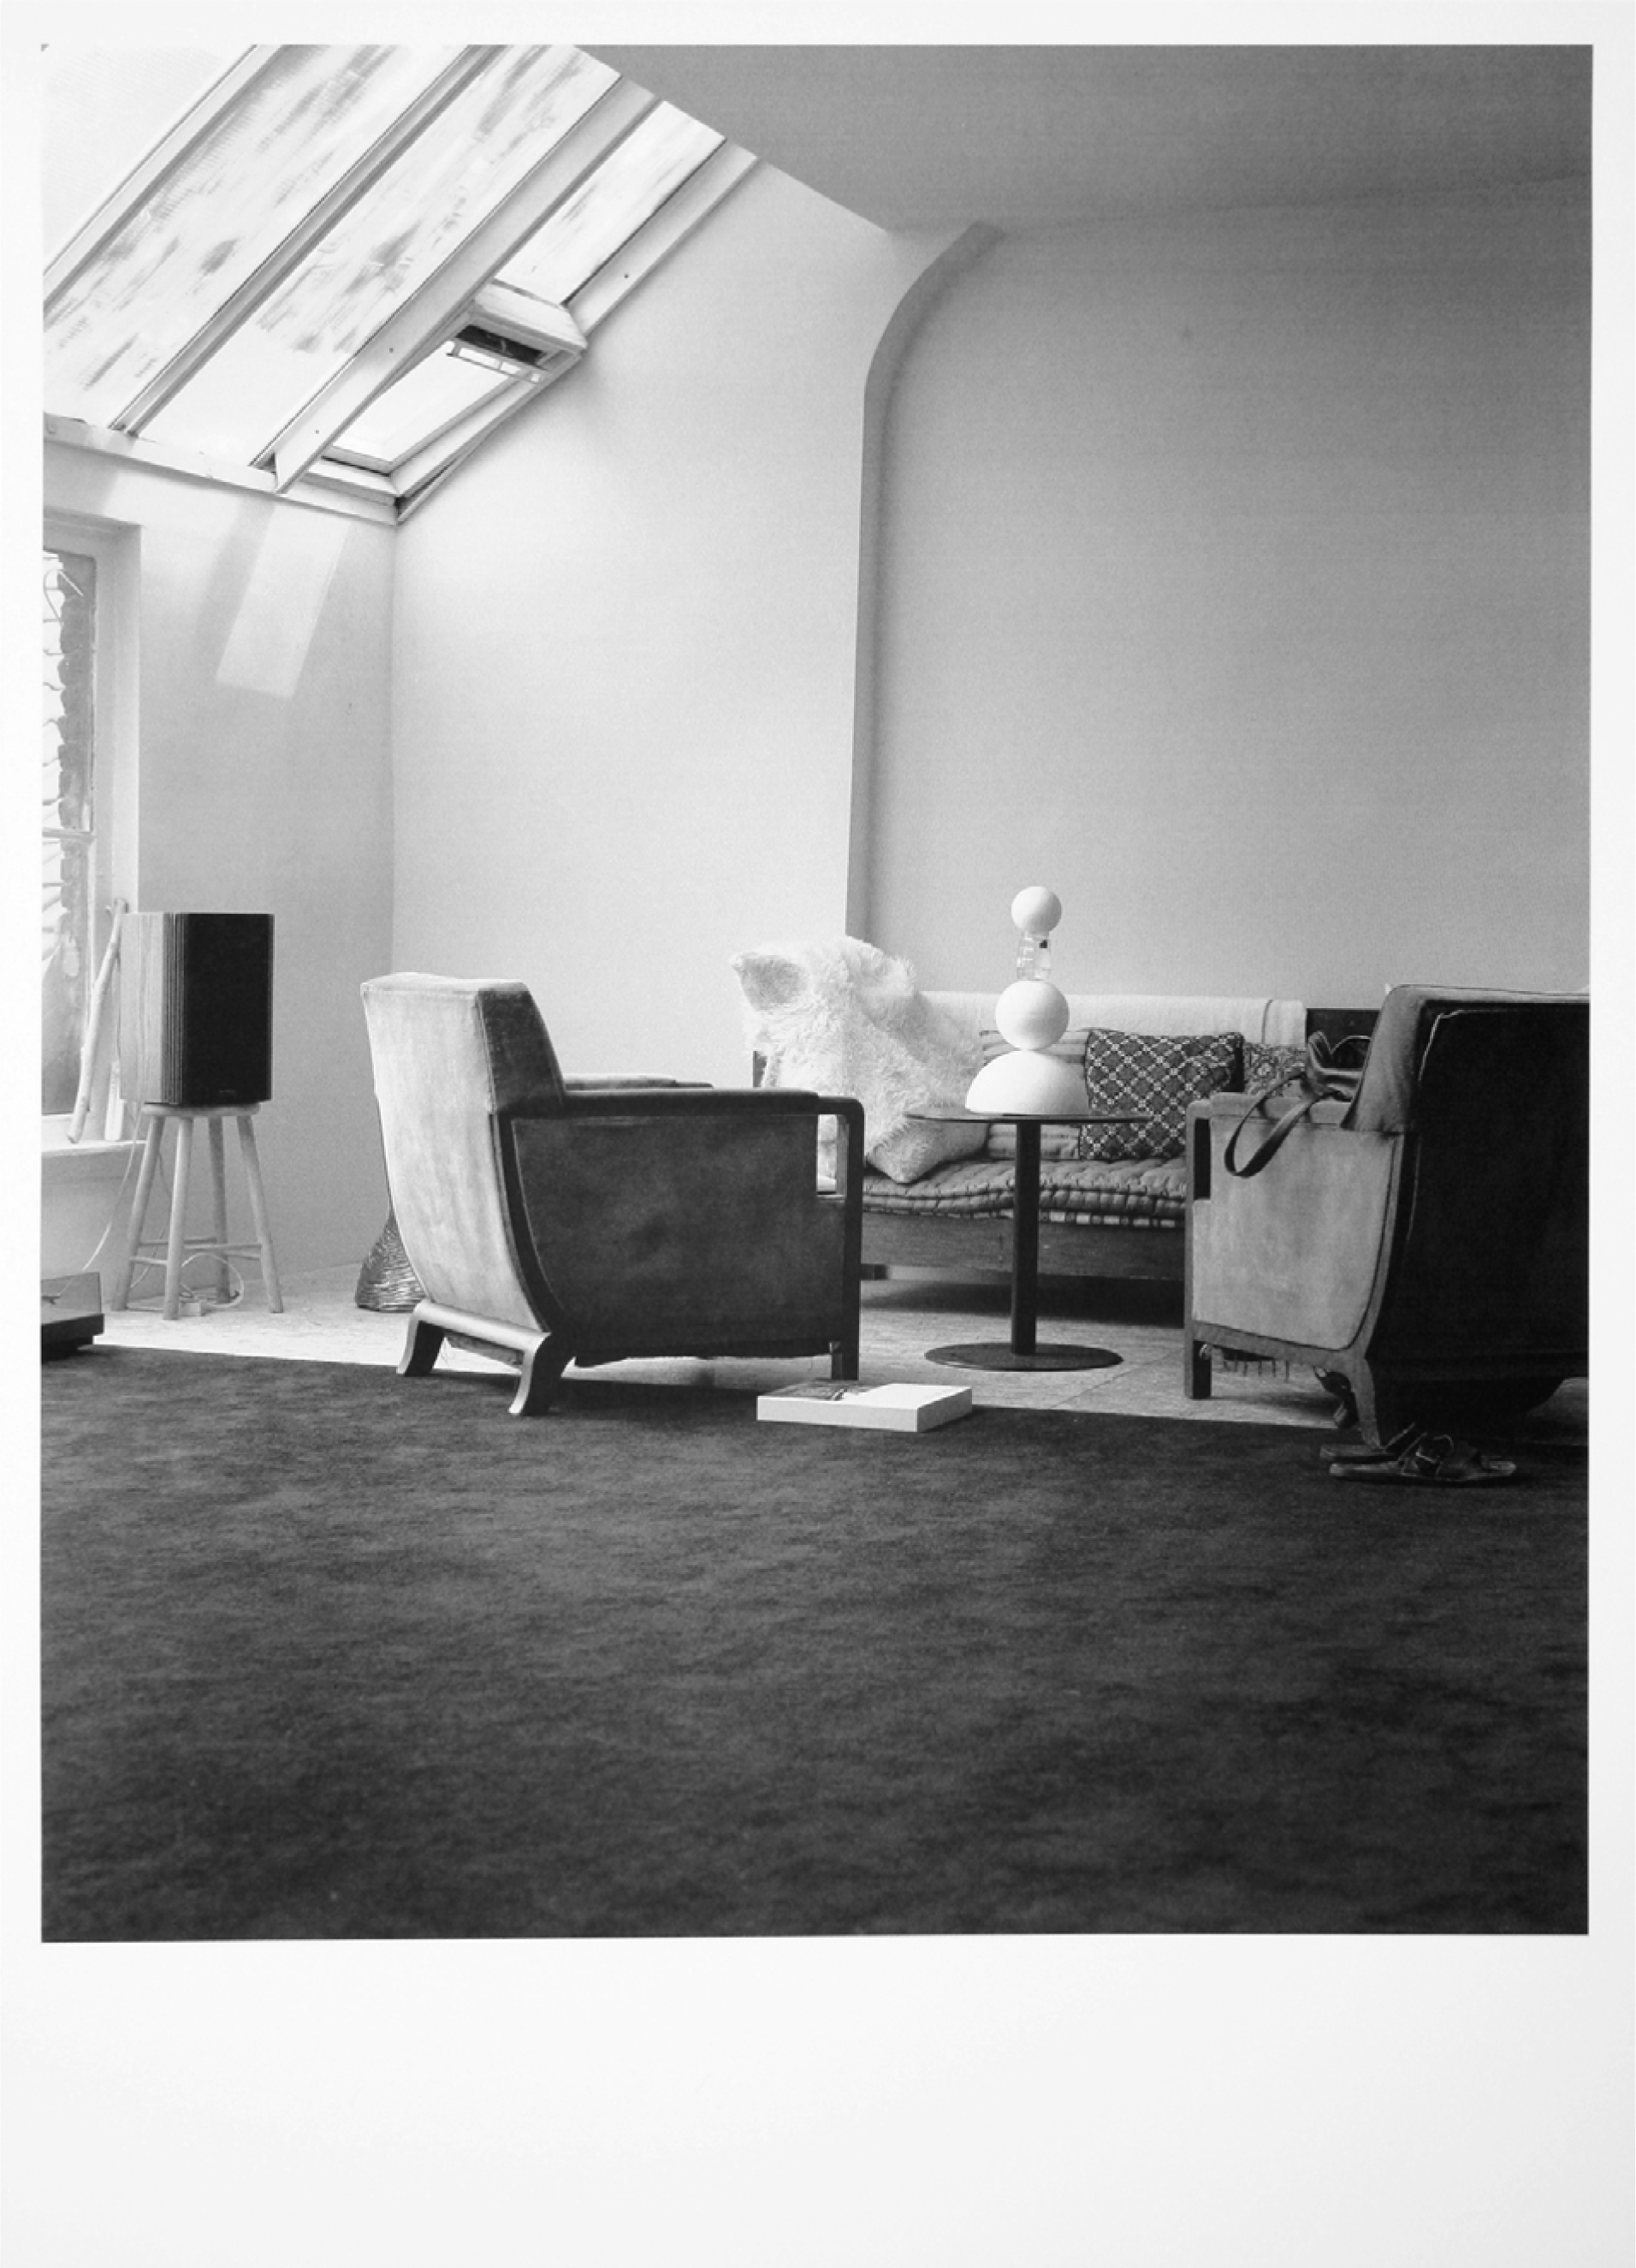 KOENRAAD DEDOBBELEER. It's Only as Clear as it Image Gets, 2010 | ACCROCHAGE #1: Allen Ruppersberg et Al. | ProjecteSD